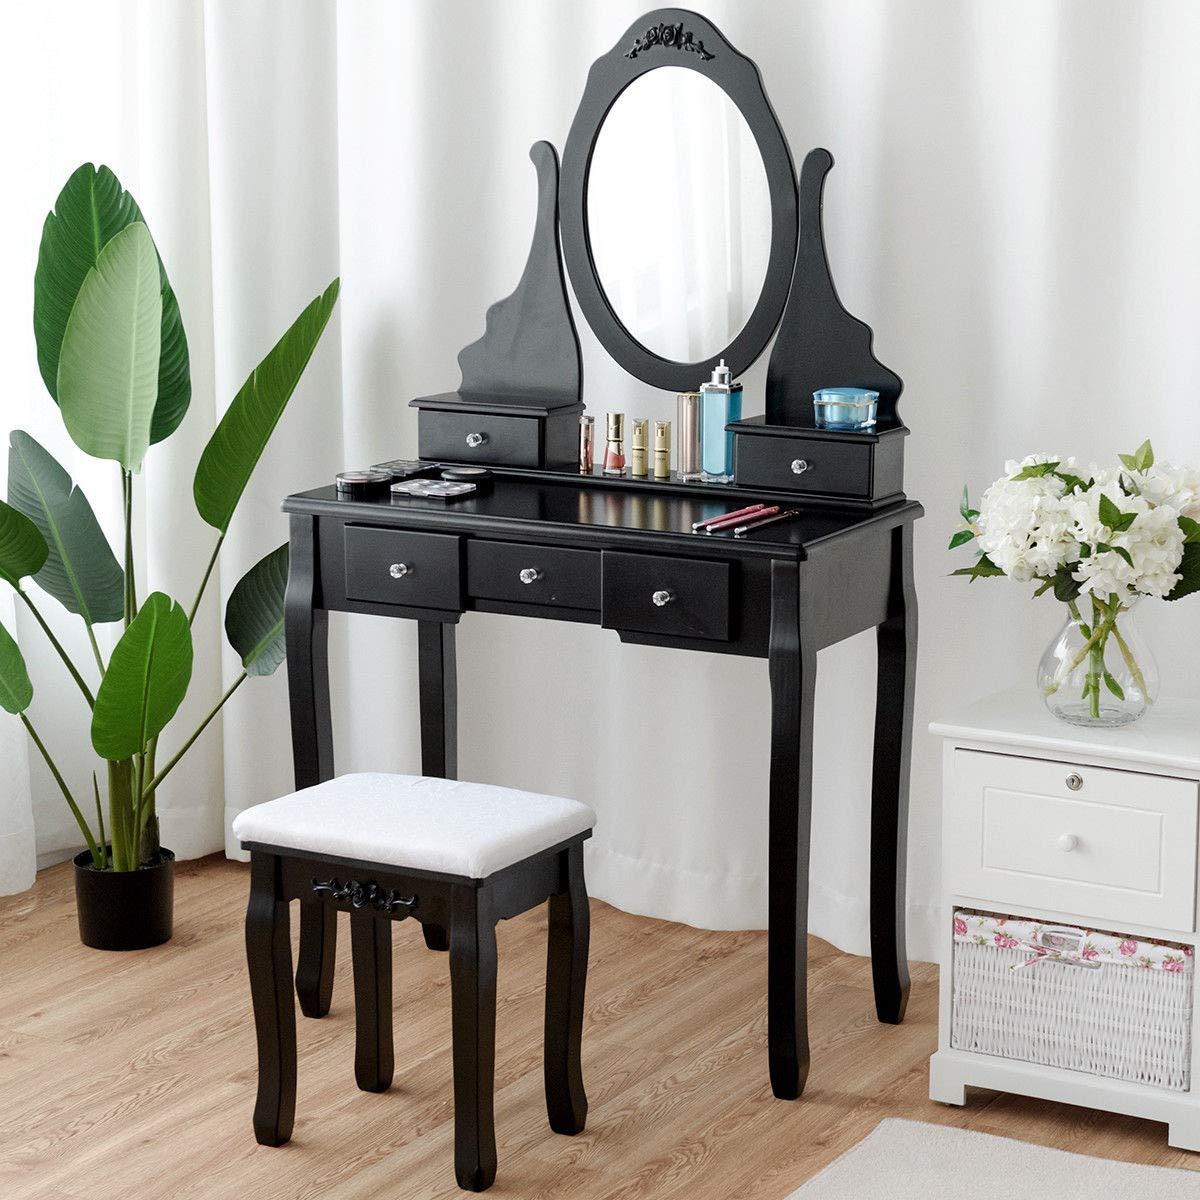 - Amazon.com: Black Mirrored Jewelry Wooden Vanity Table Set With 5